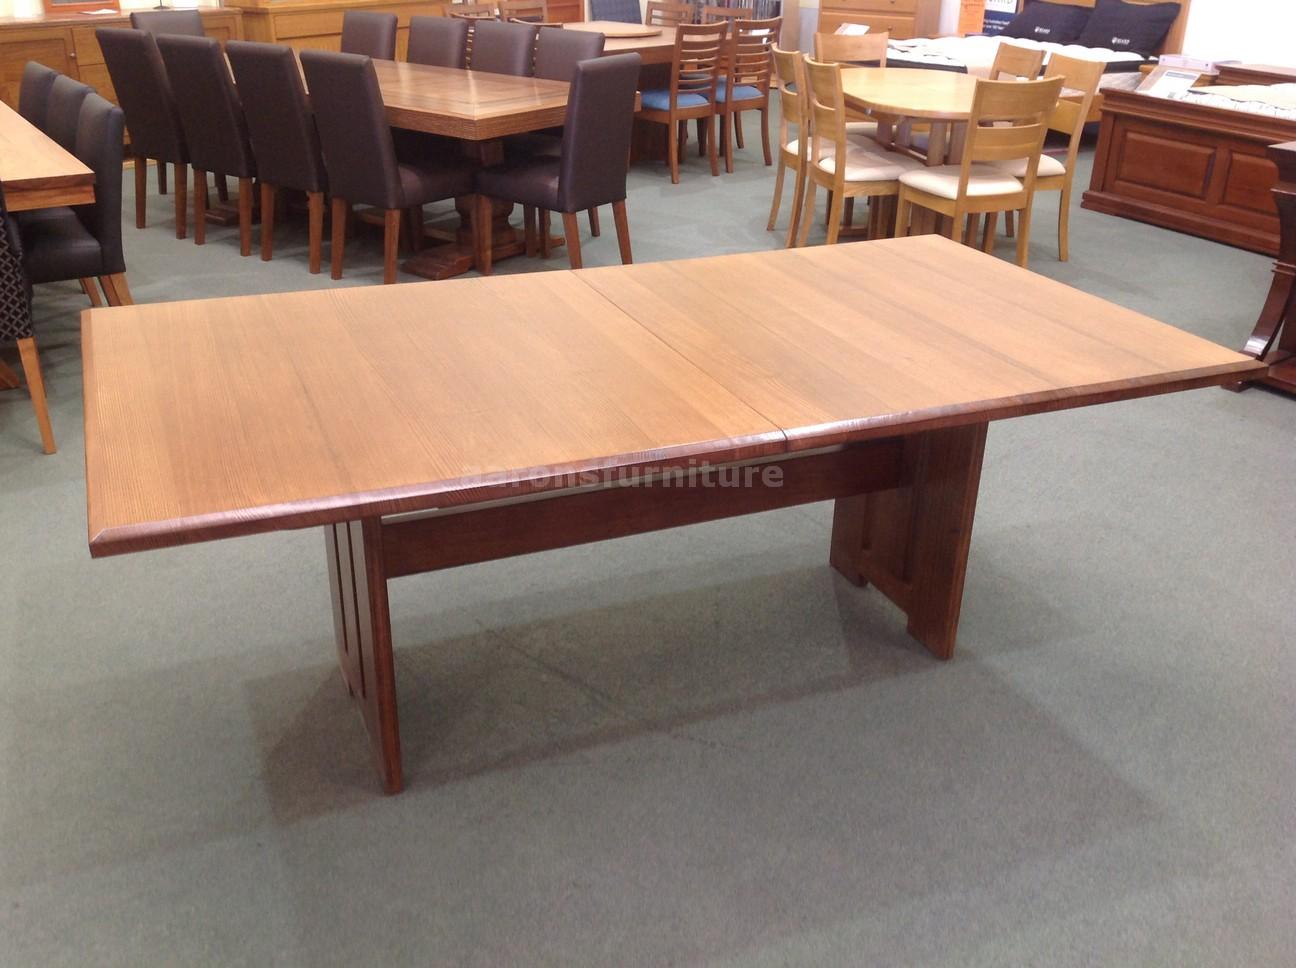 Dining aarons furniture tasmanian oak blackwood for 12 seater dining table sydney